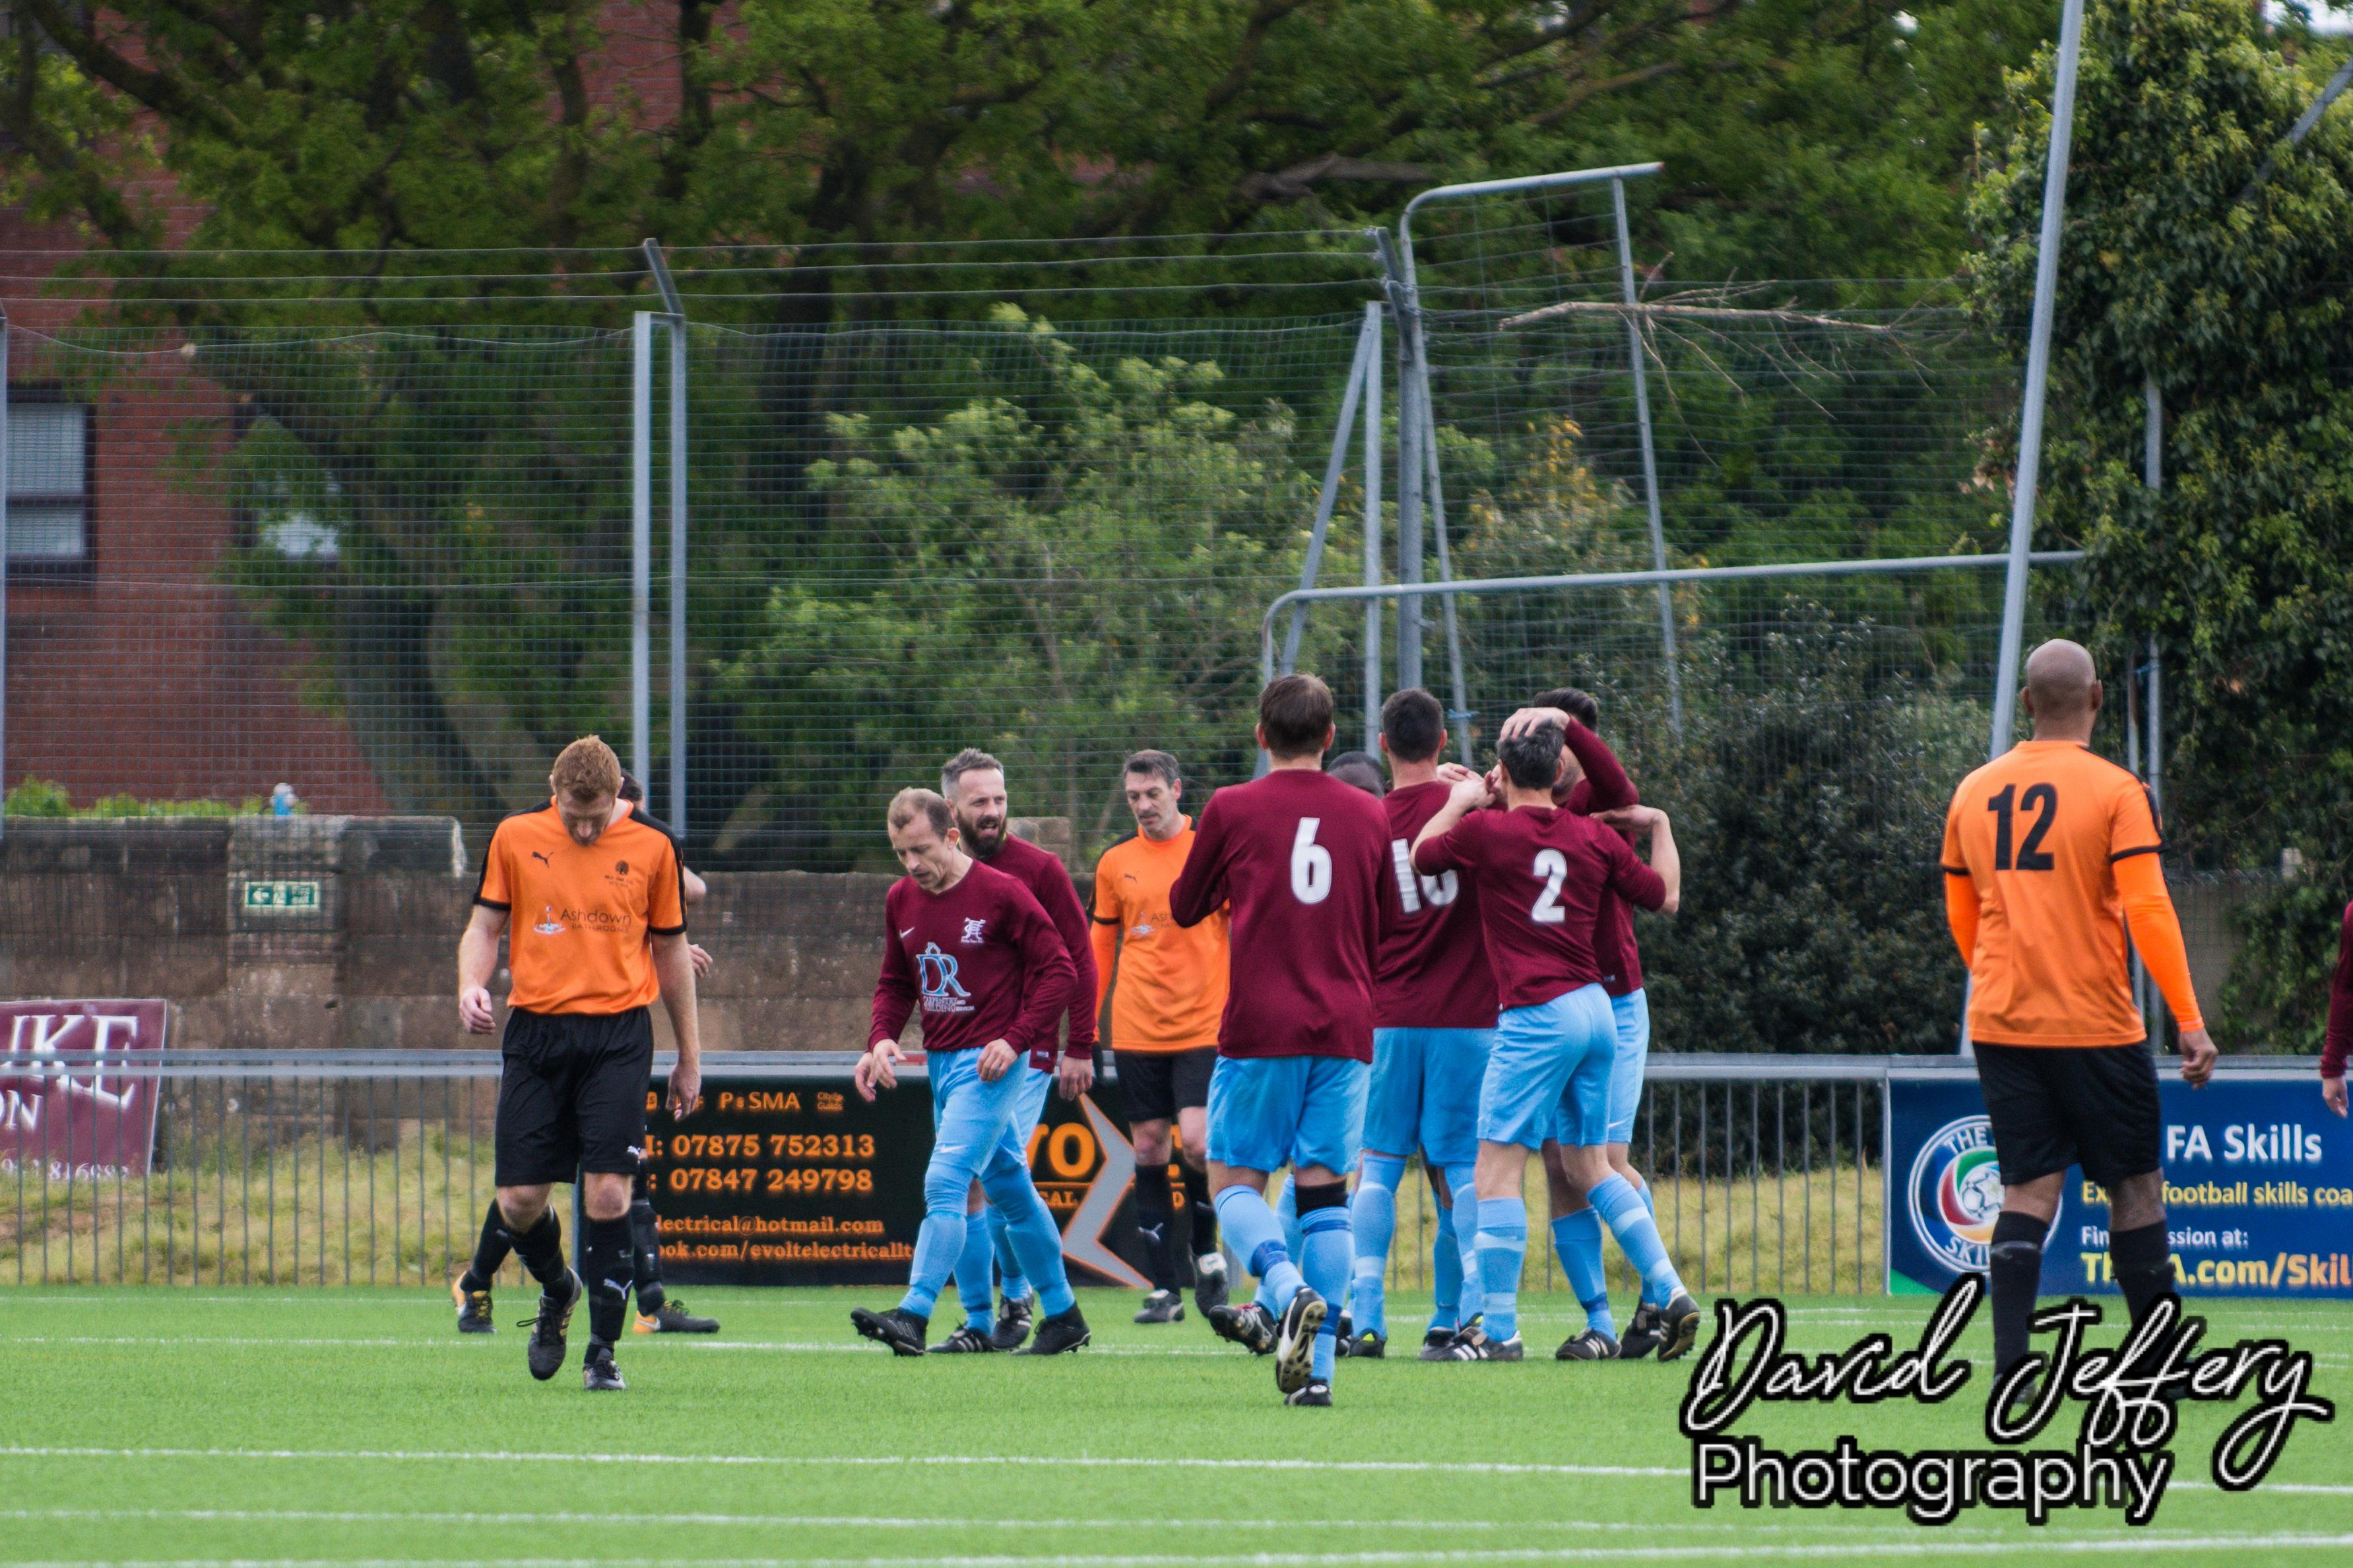 043 MOFC Vets vs Horl Vets 05.05